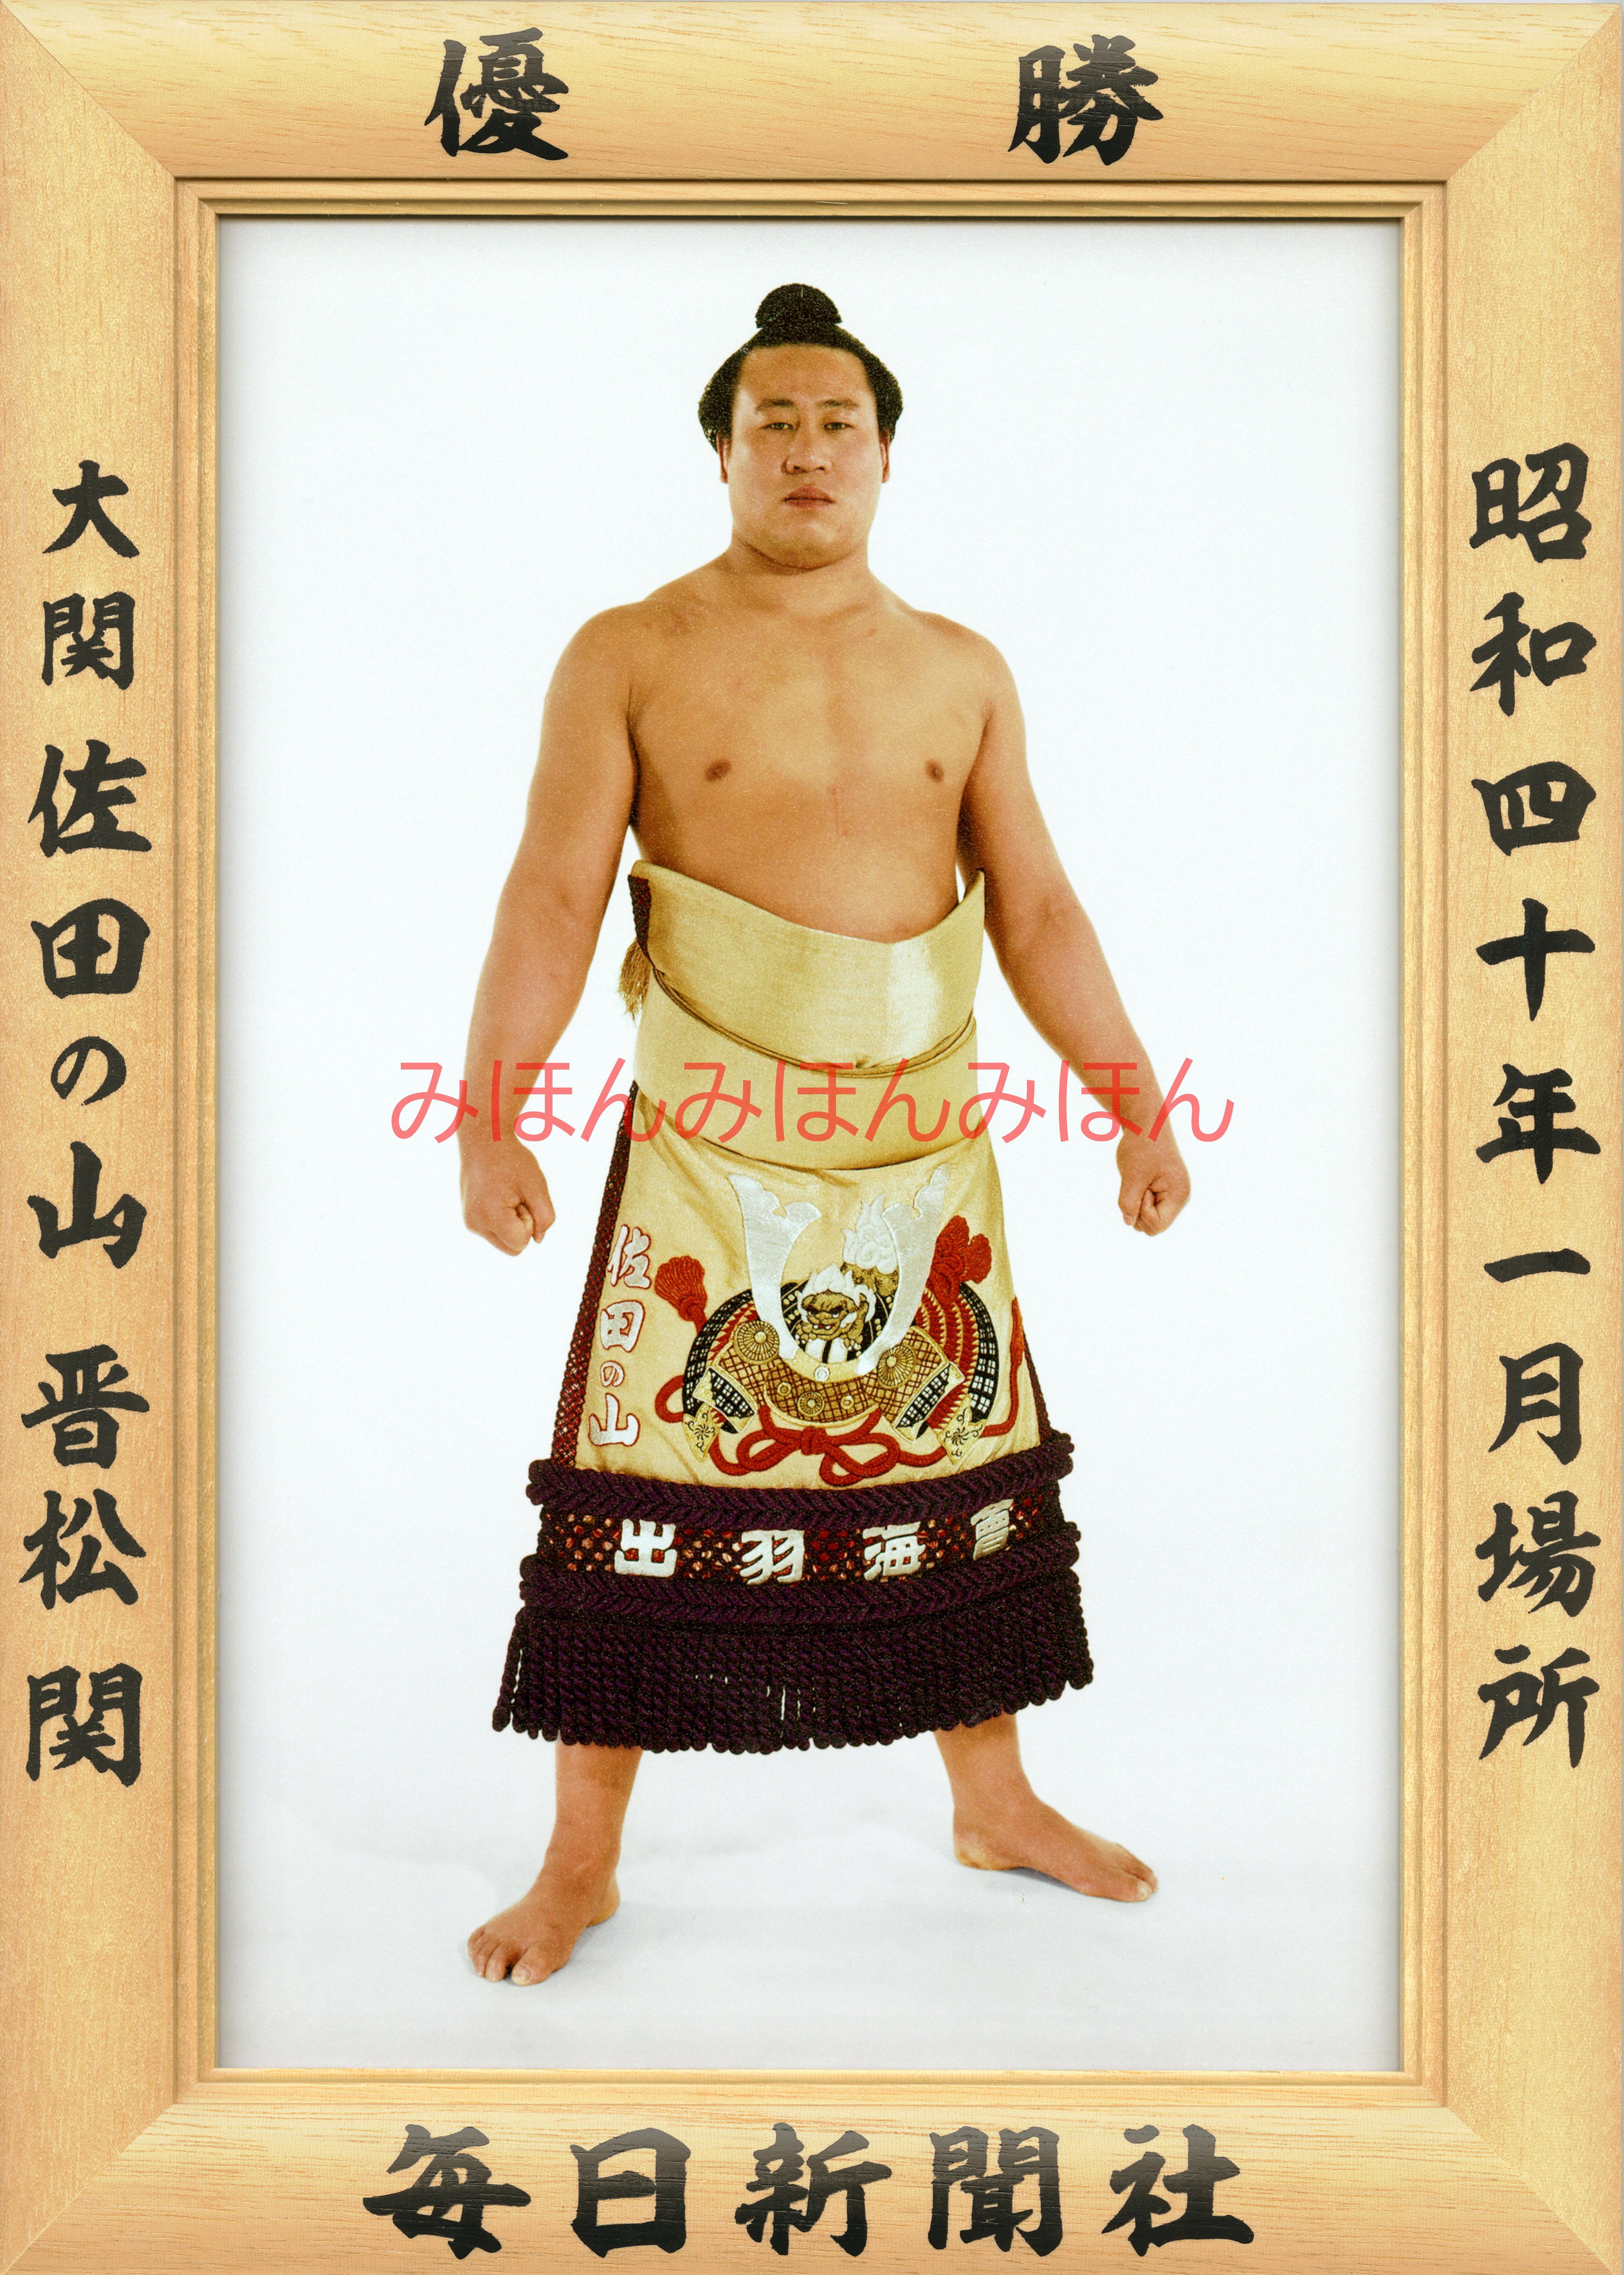 昭和40年1月場所優勝 大関 佐田の山晋松関(3回目の優勝)